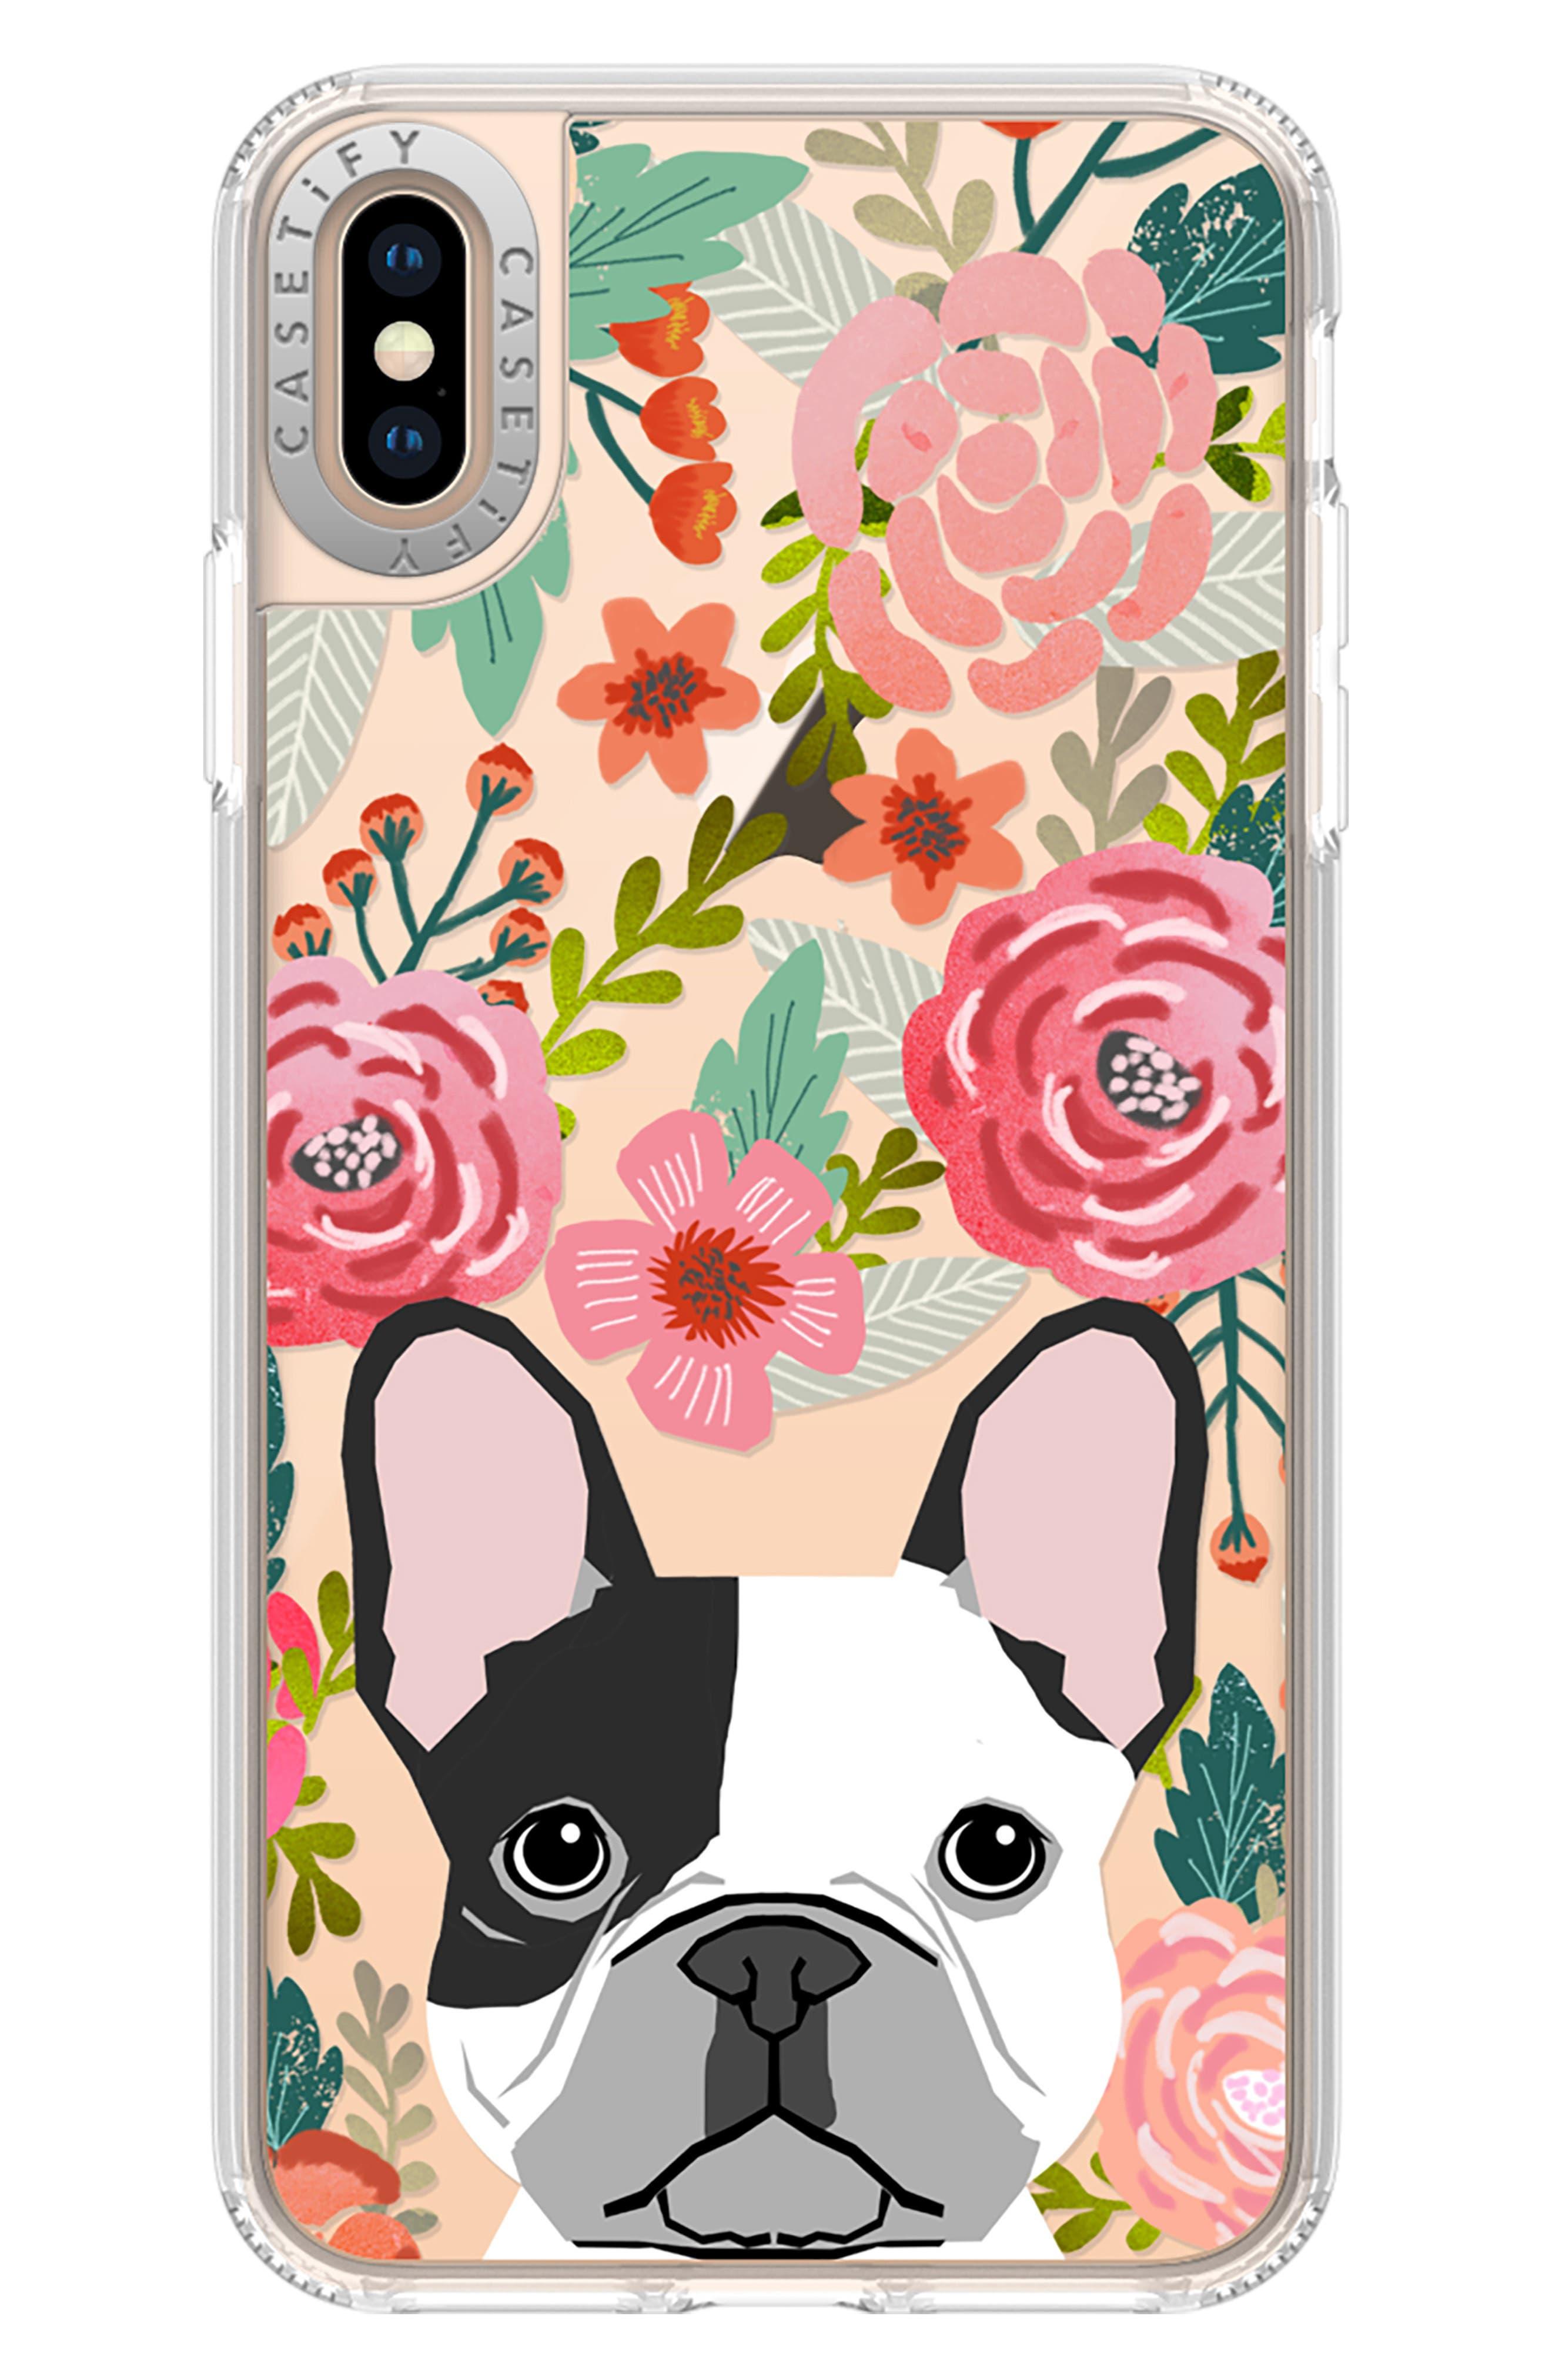 French Bulldog Grip iPhone X/Xs, XR & X Max Case,                             Alternate thumbnail 5, color,                             650